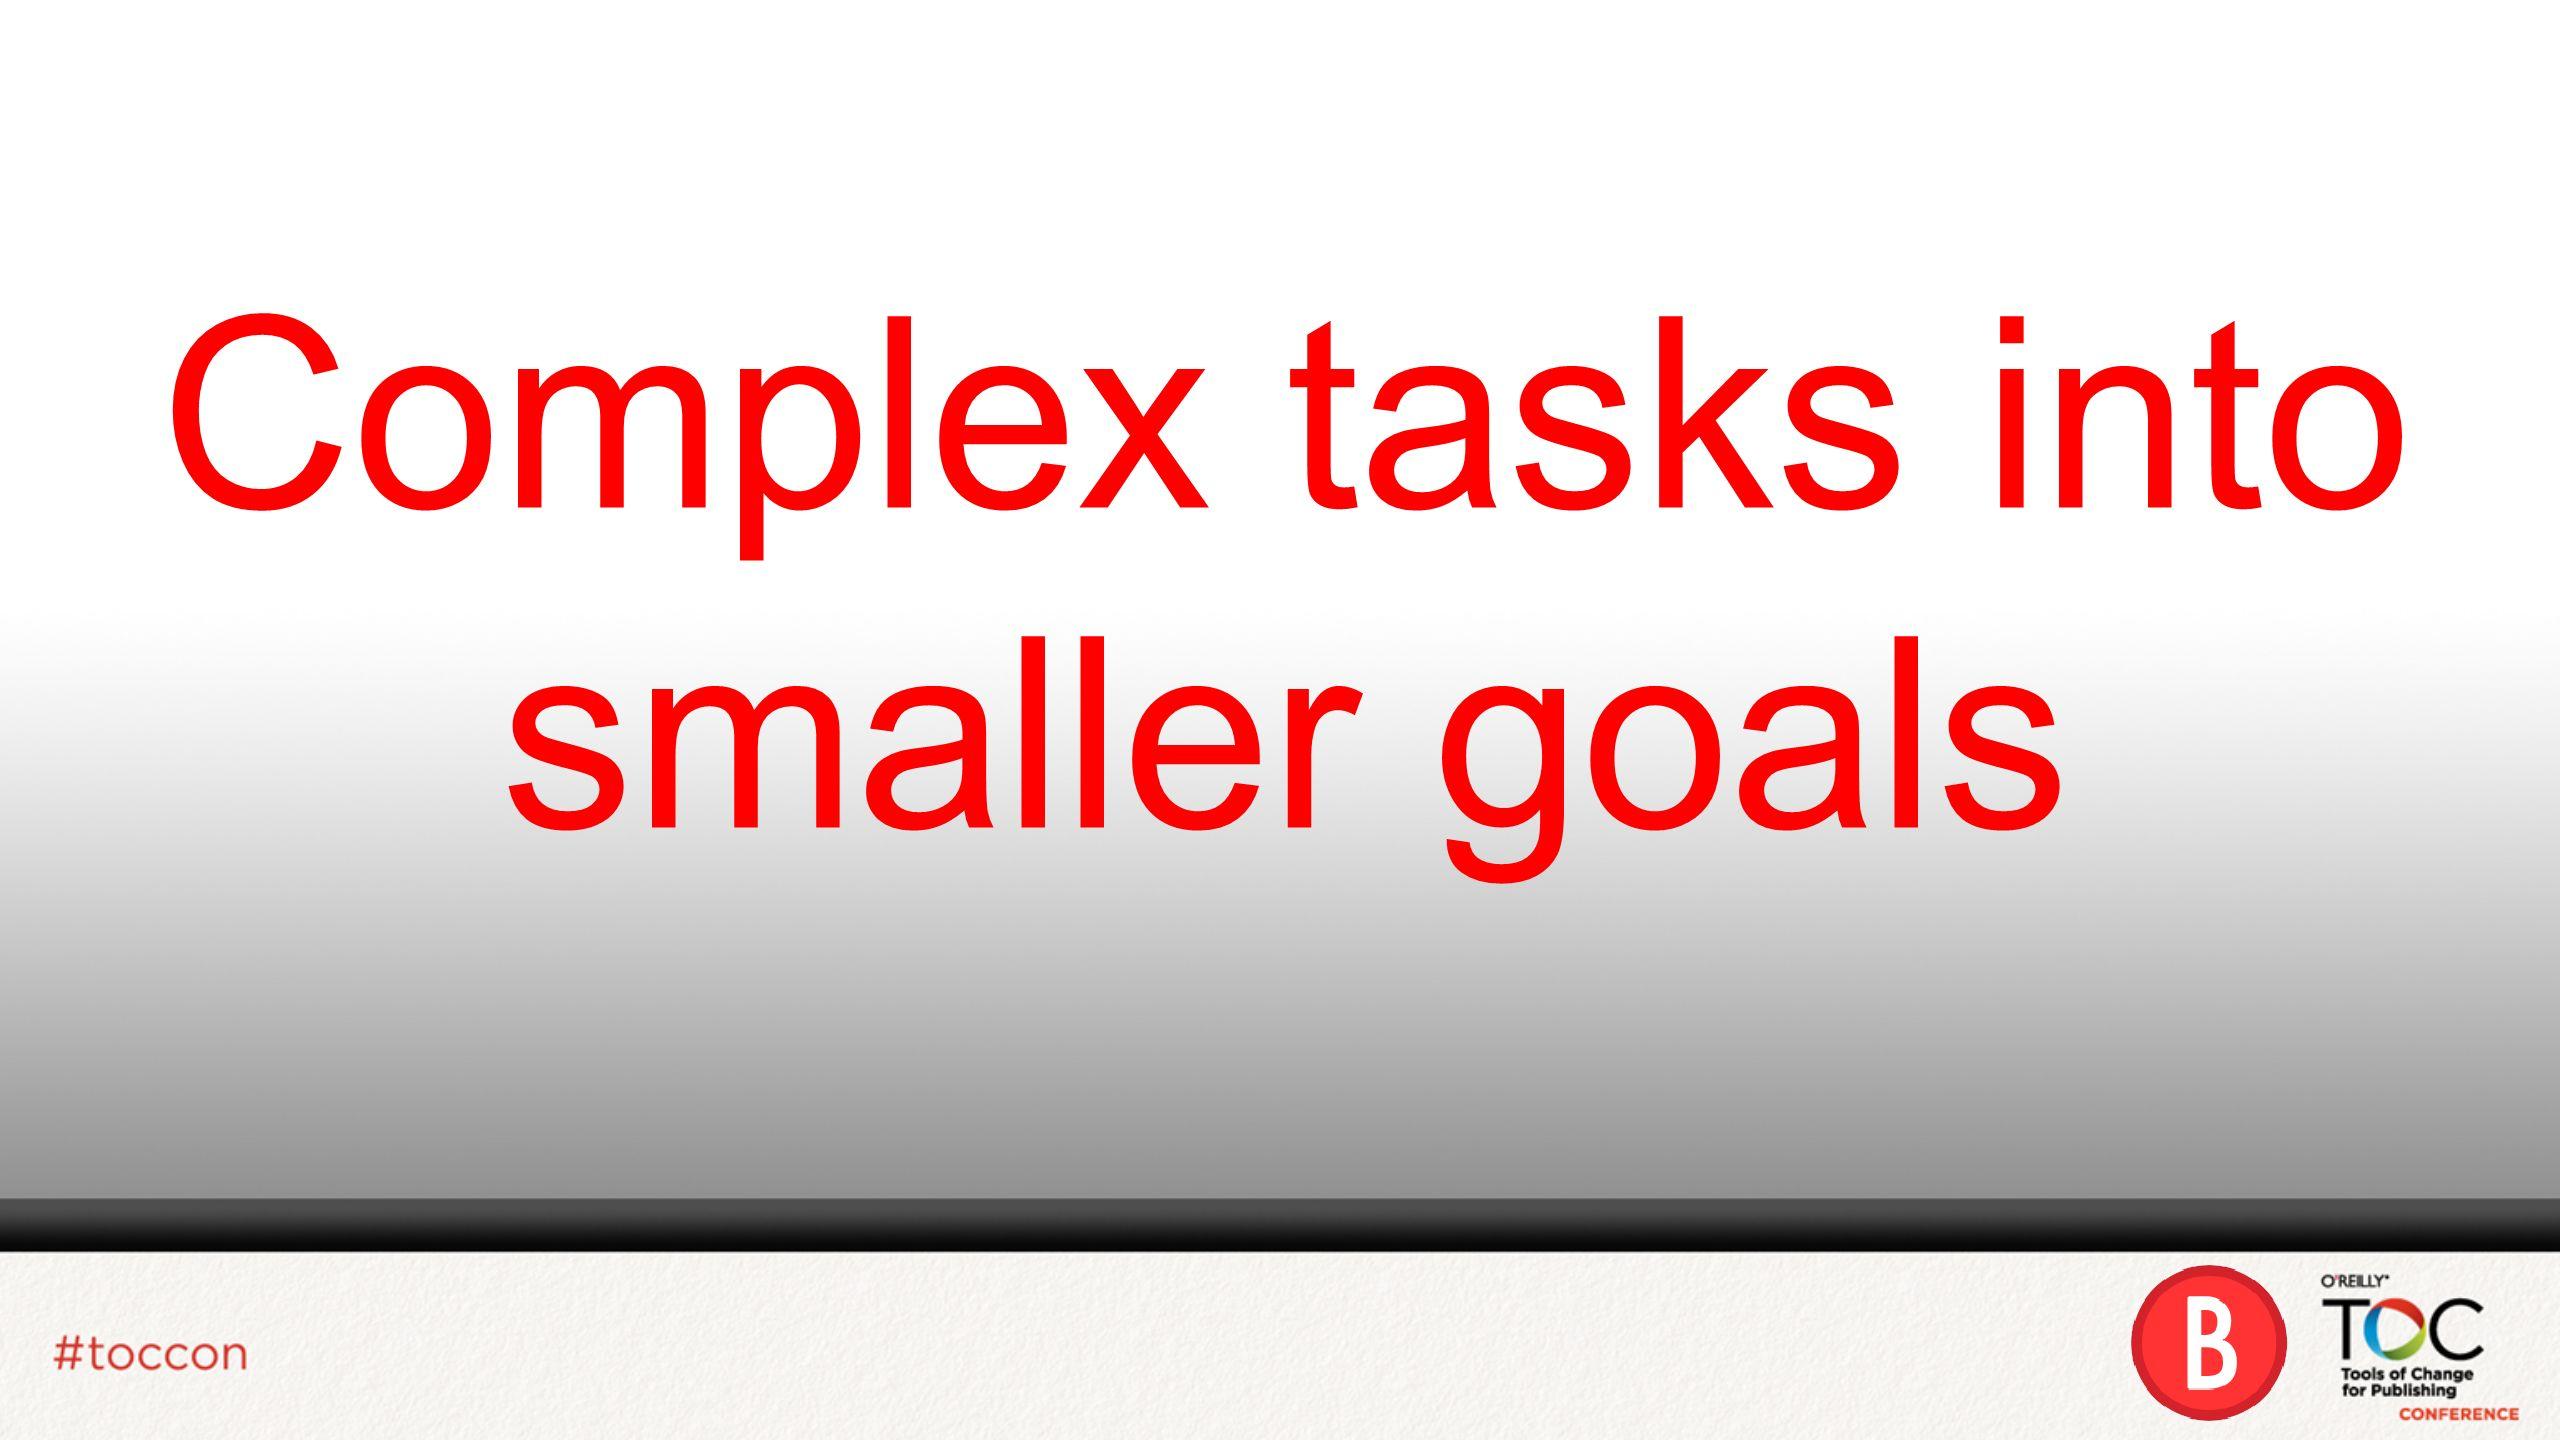 Complex tasks into smaller goals